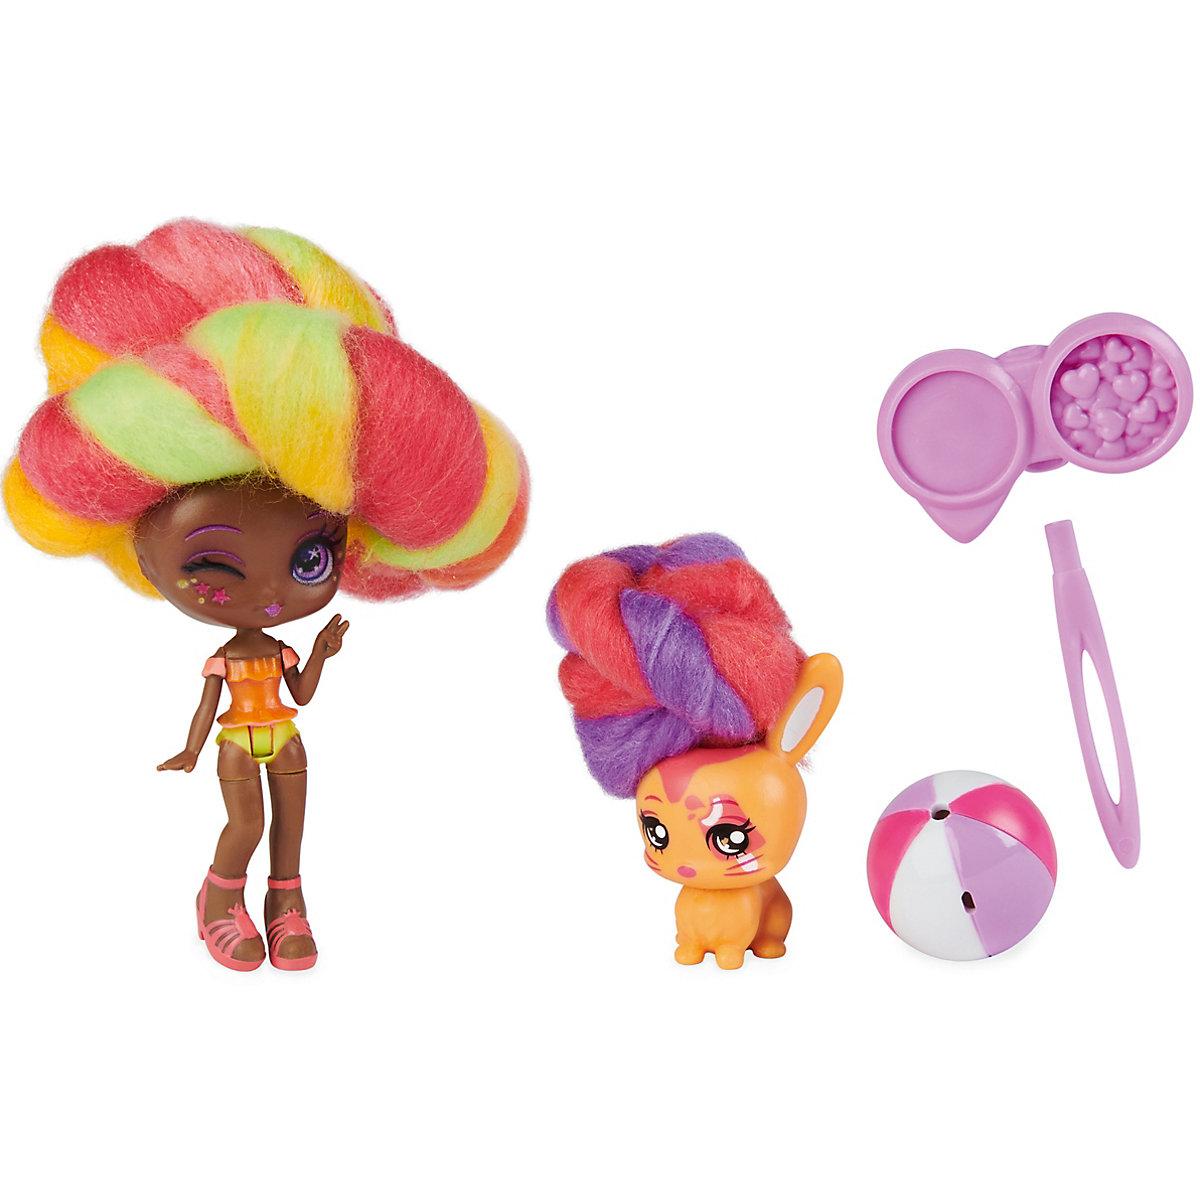 Candylocks - Doll and Pet / Margo Punch & Bridget Bunny Spin Master xpln7